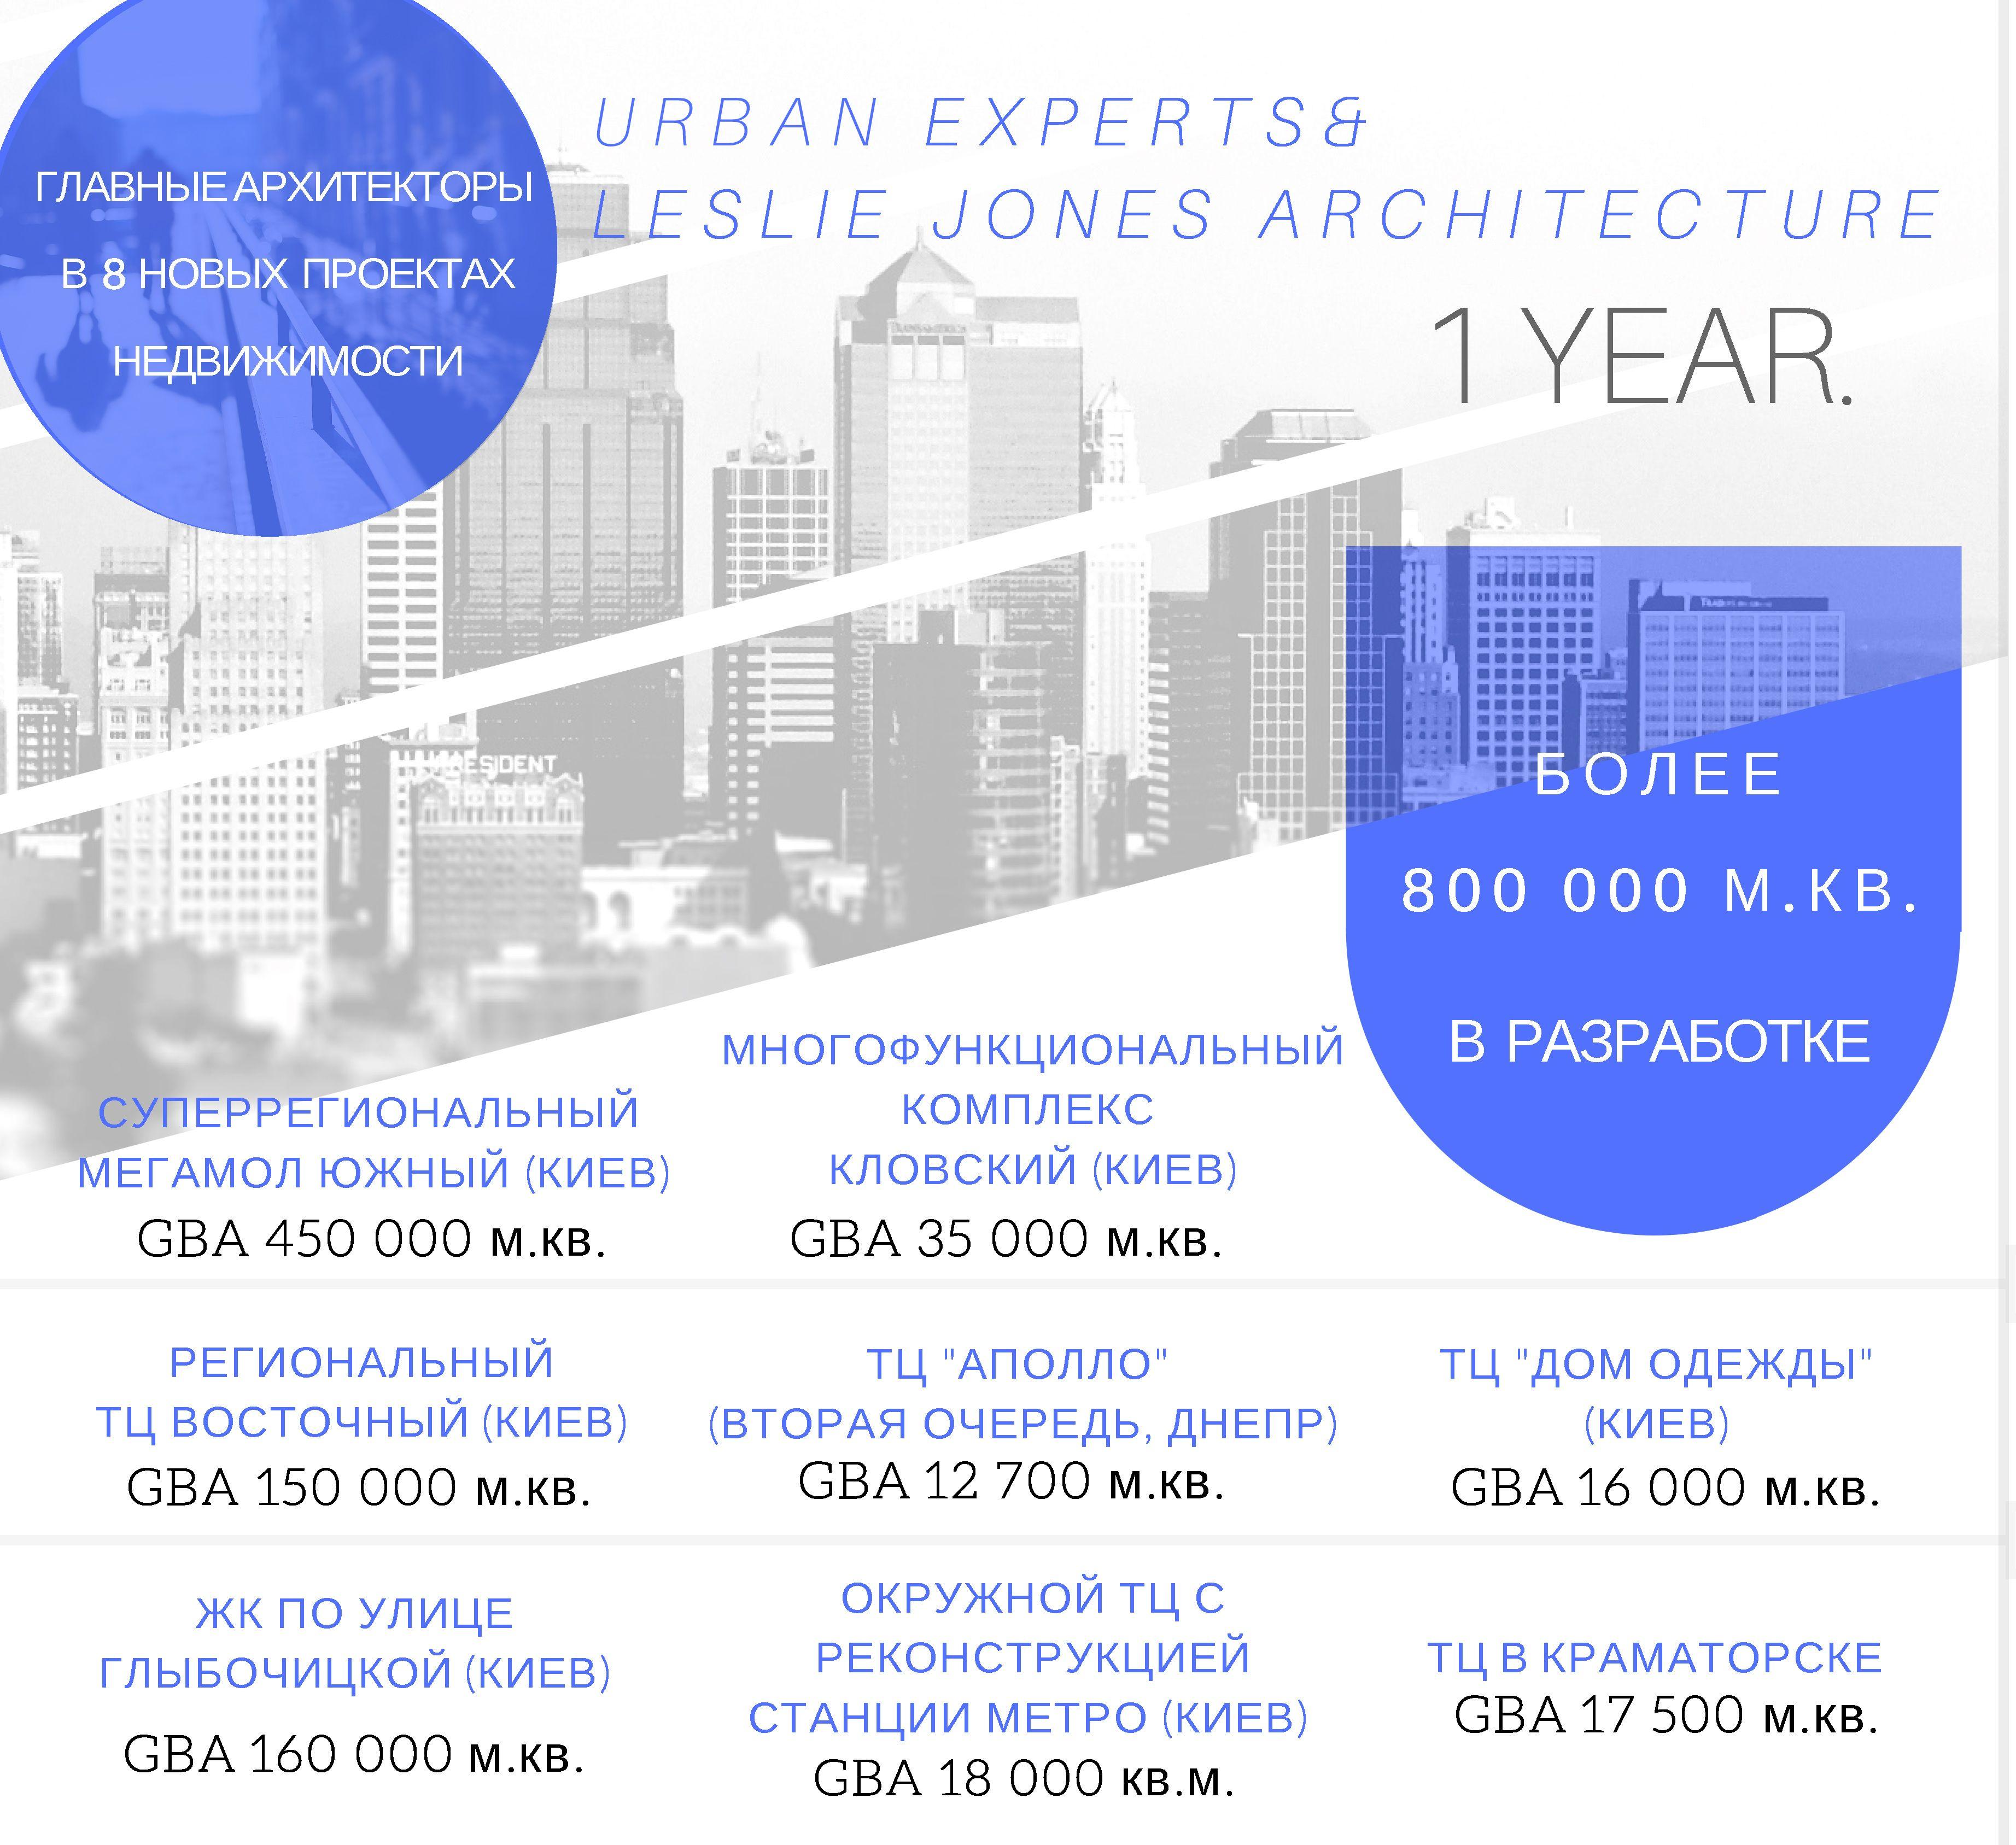 Urban Experts&Leslie Jones Architecture — лидеры на рынке недвижимости Украины